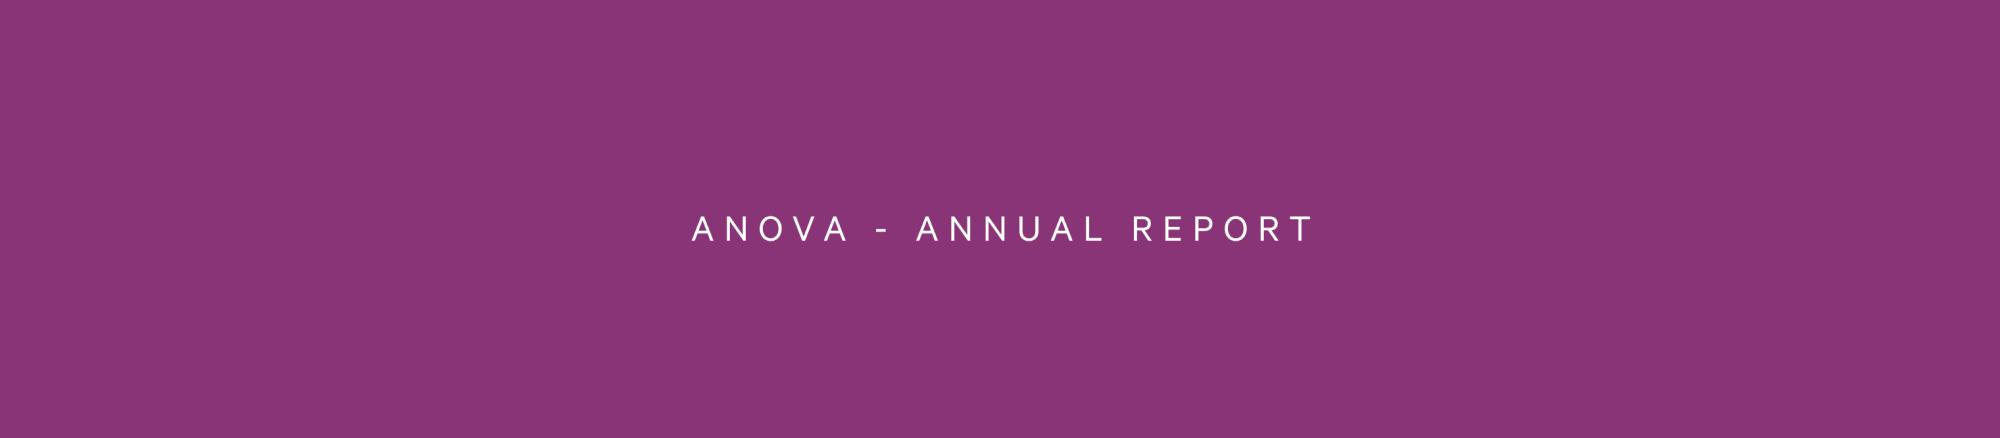 Anova - Annual Report Banner